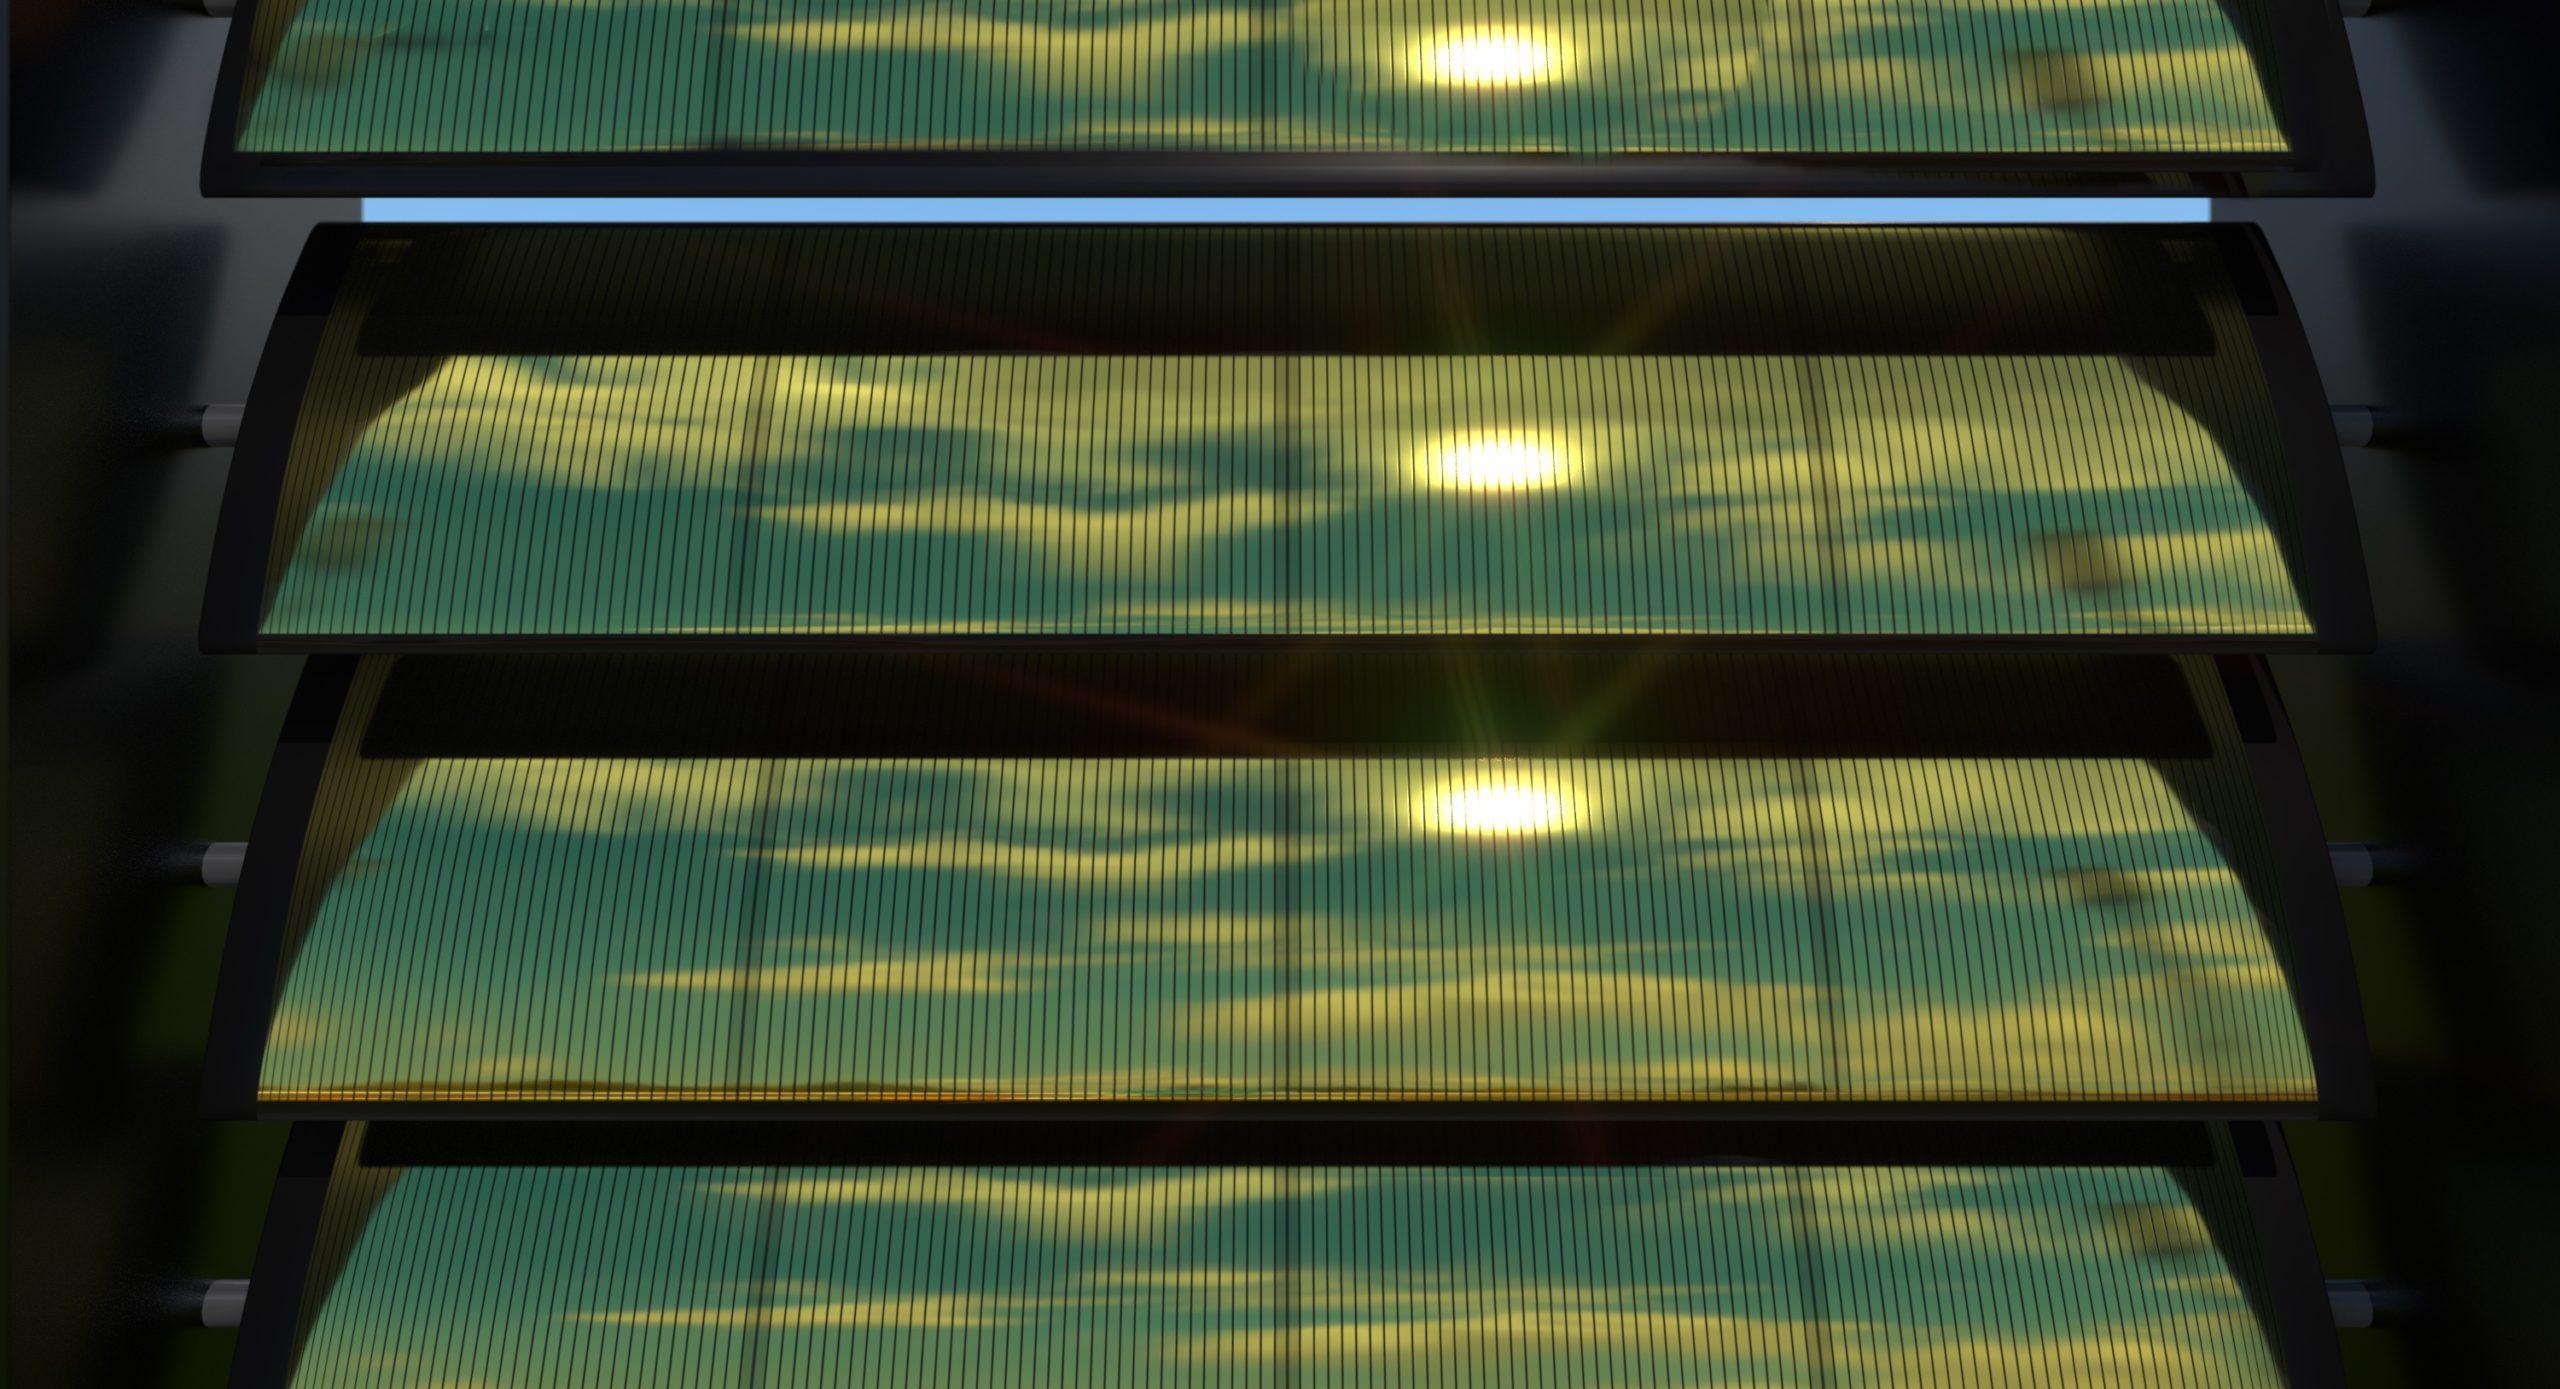 Visuals of solar sunblinds